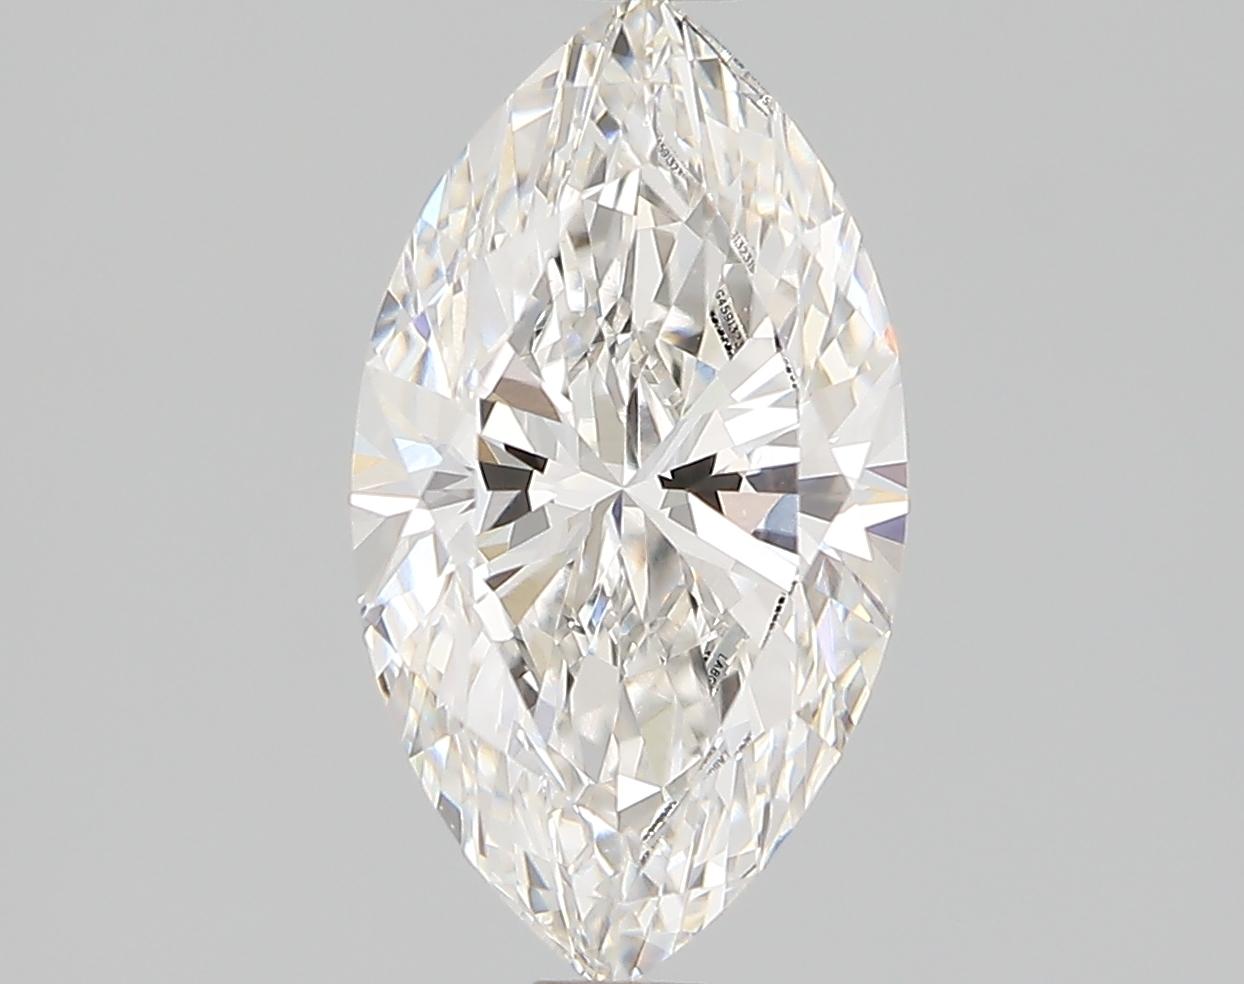 1.12 Carat F-VVS2 Ideal Marquise Diamond